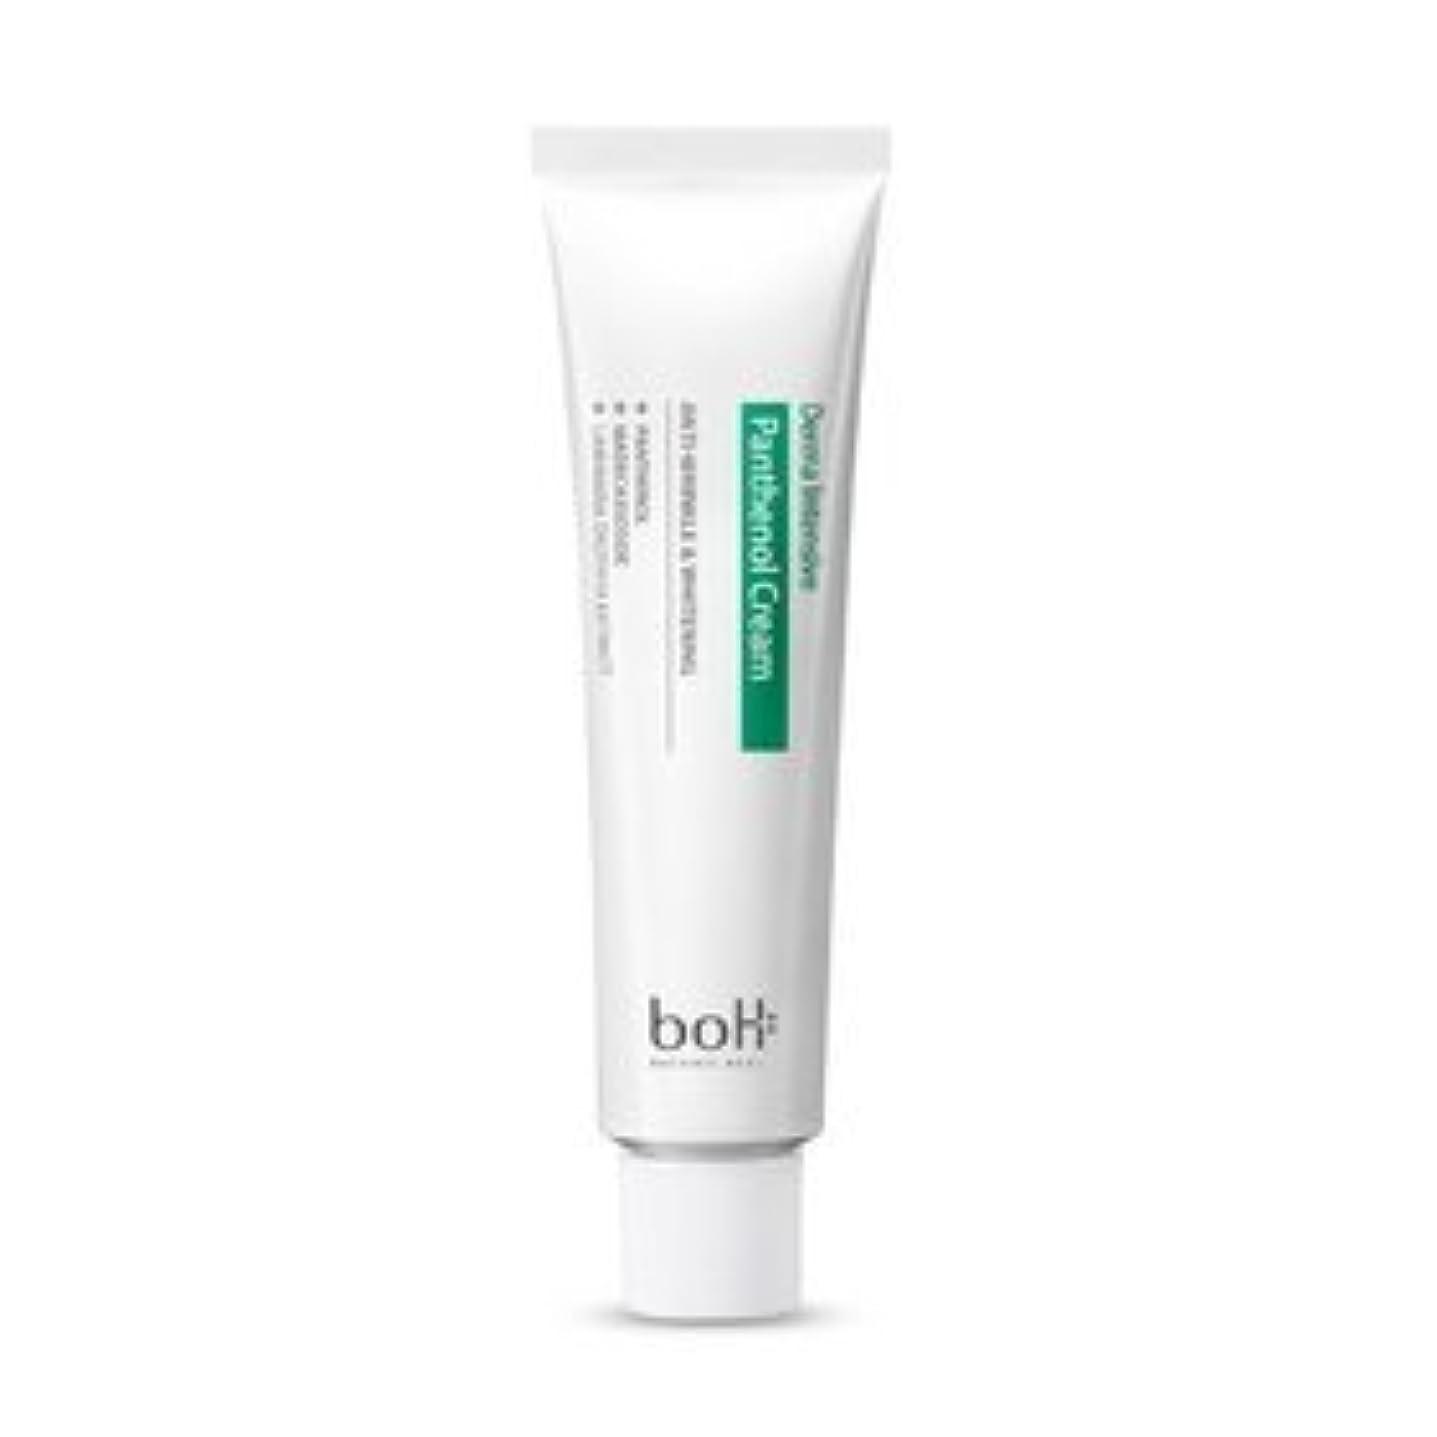 【Botanic Hill Boh(ボ)】ダーマインテンシブ パンテノール クリーム 50ml [並行輸入品]